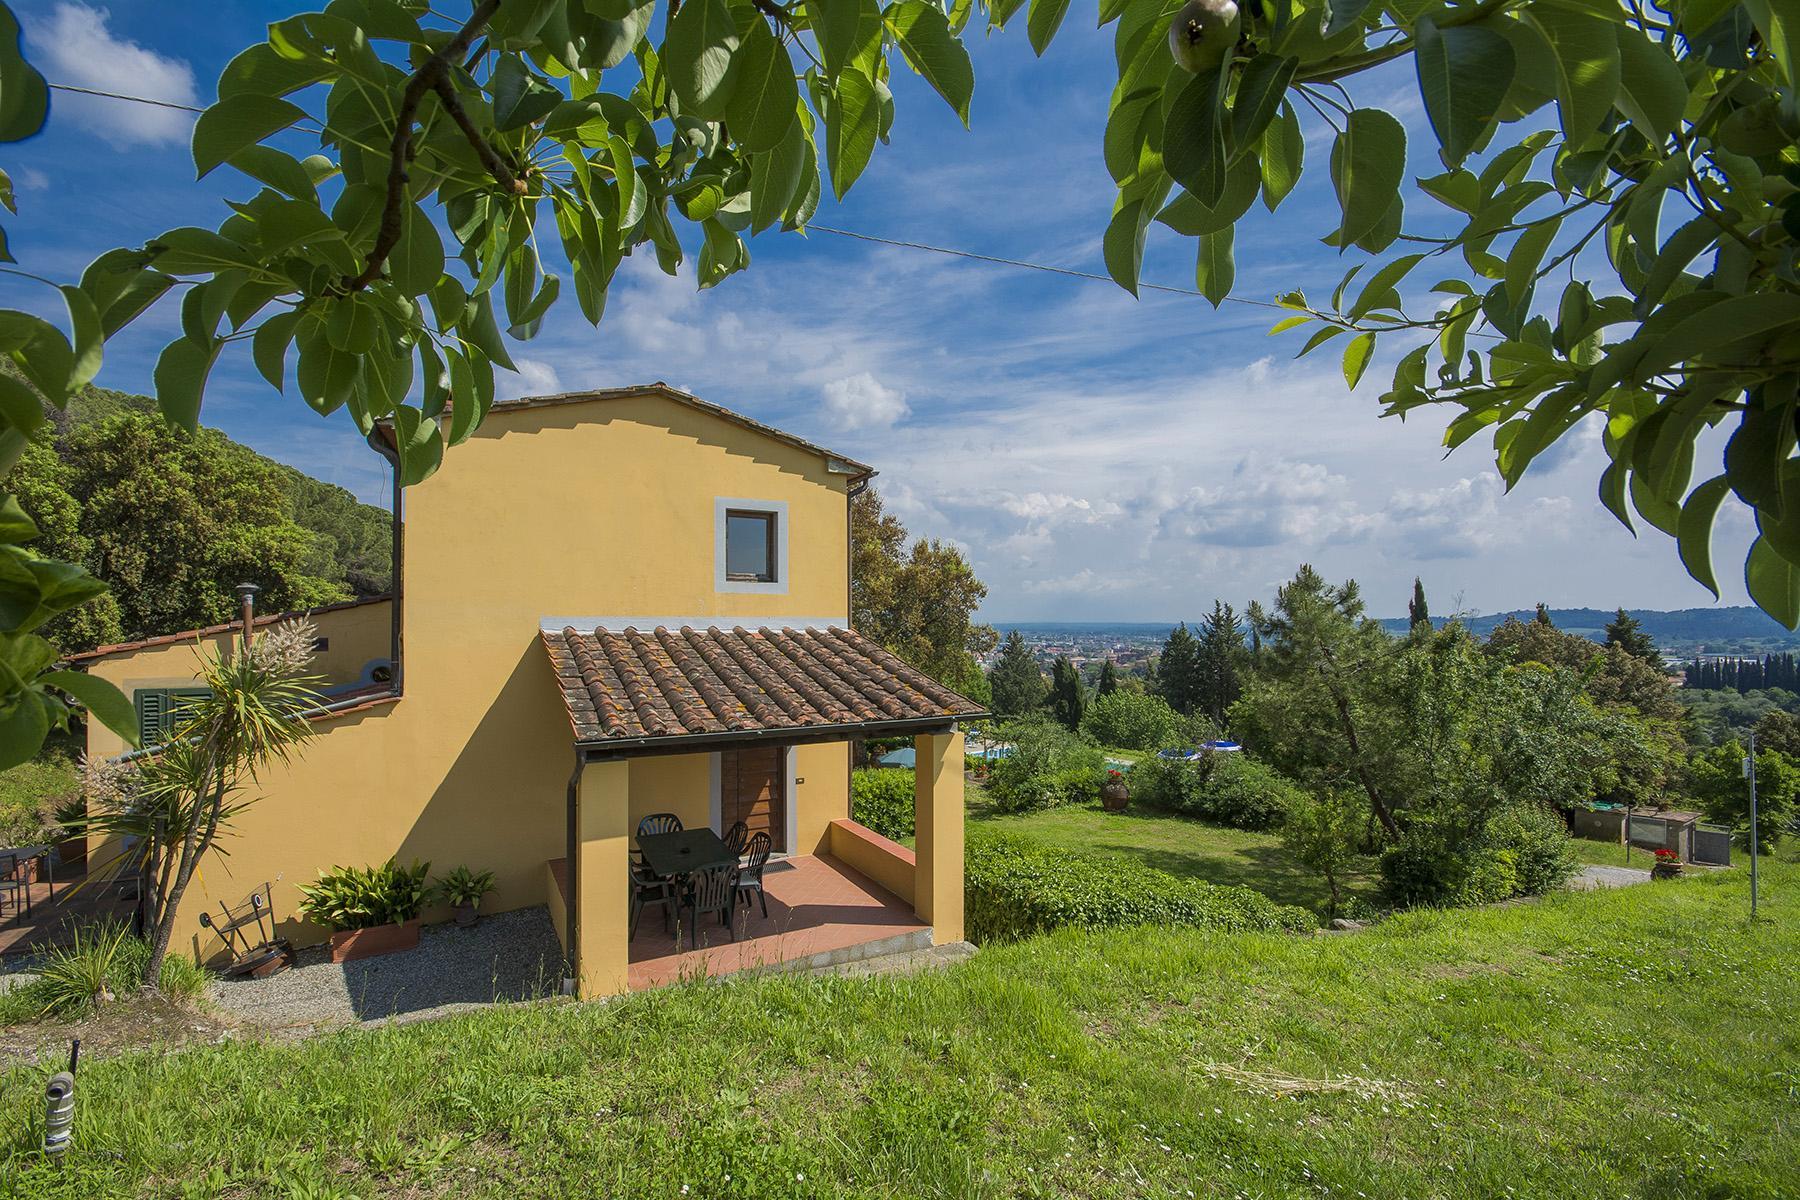 Pescia小山丘上美丽的乡间农舍 - 35